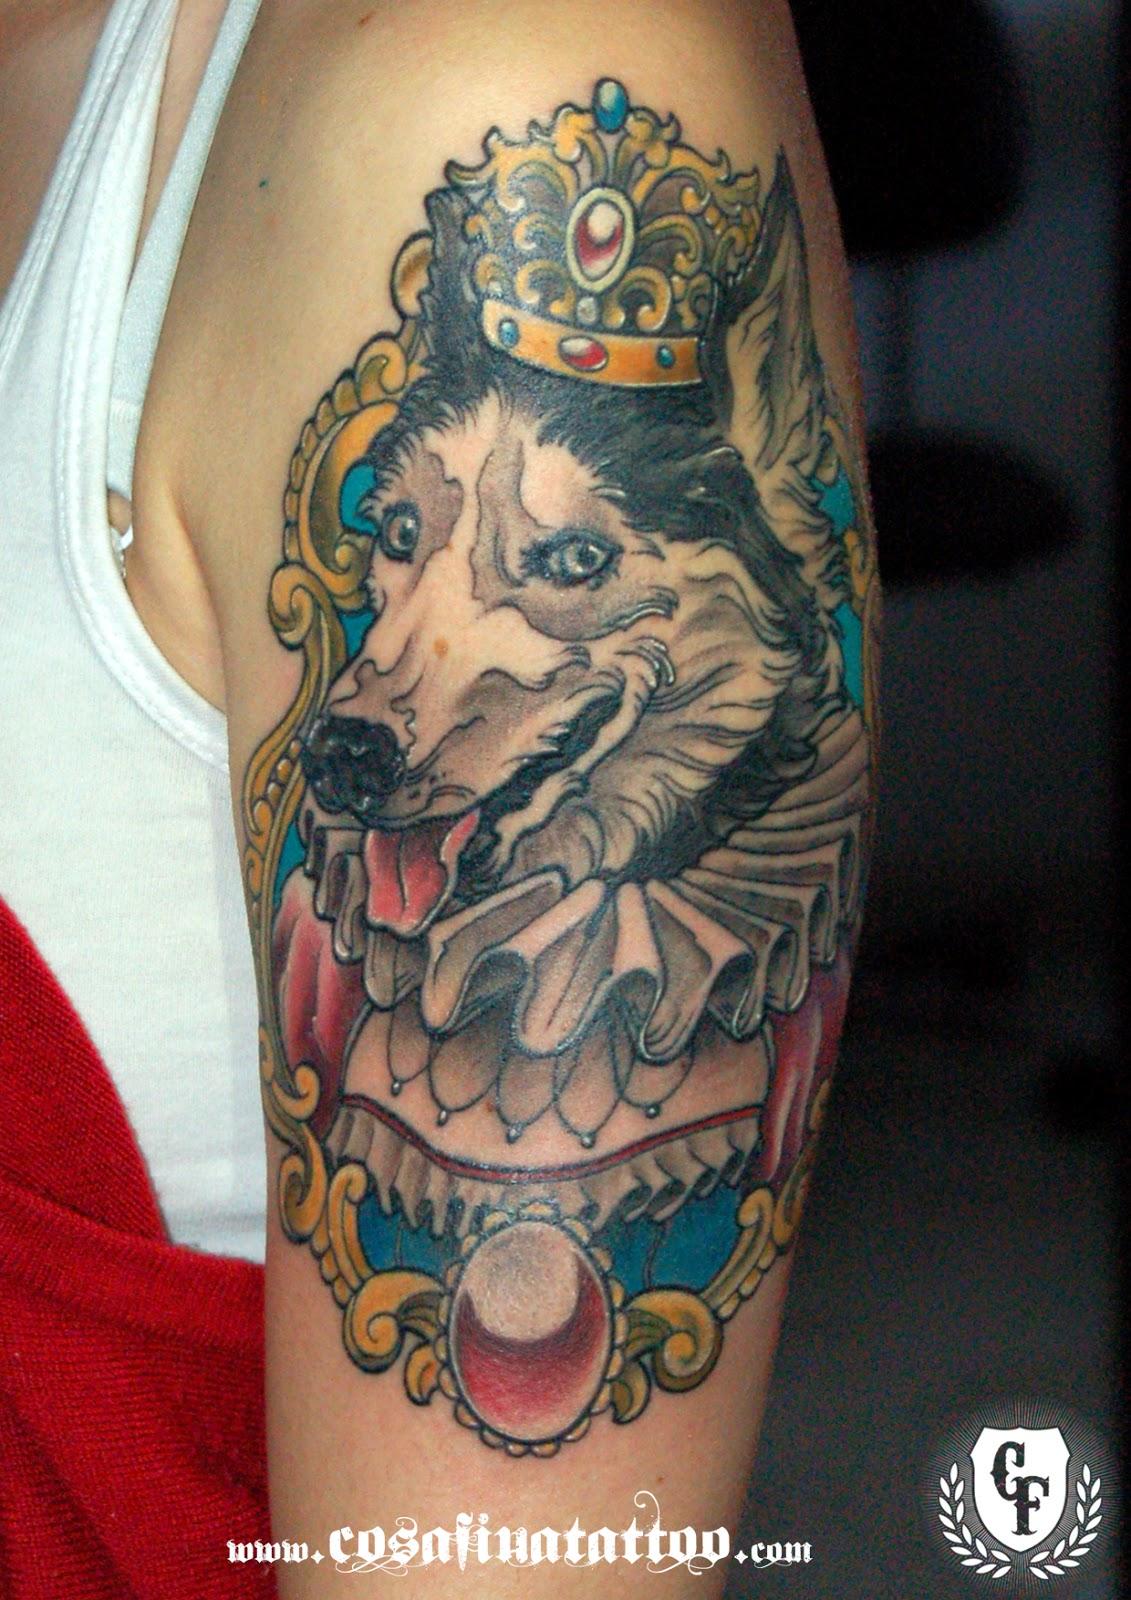 CosaFina tattoo Carlos Art Studio: tatuaje perro husky ...